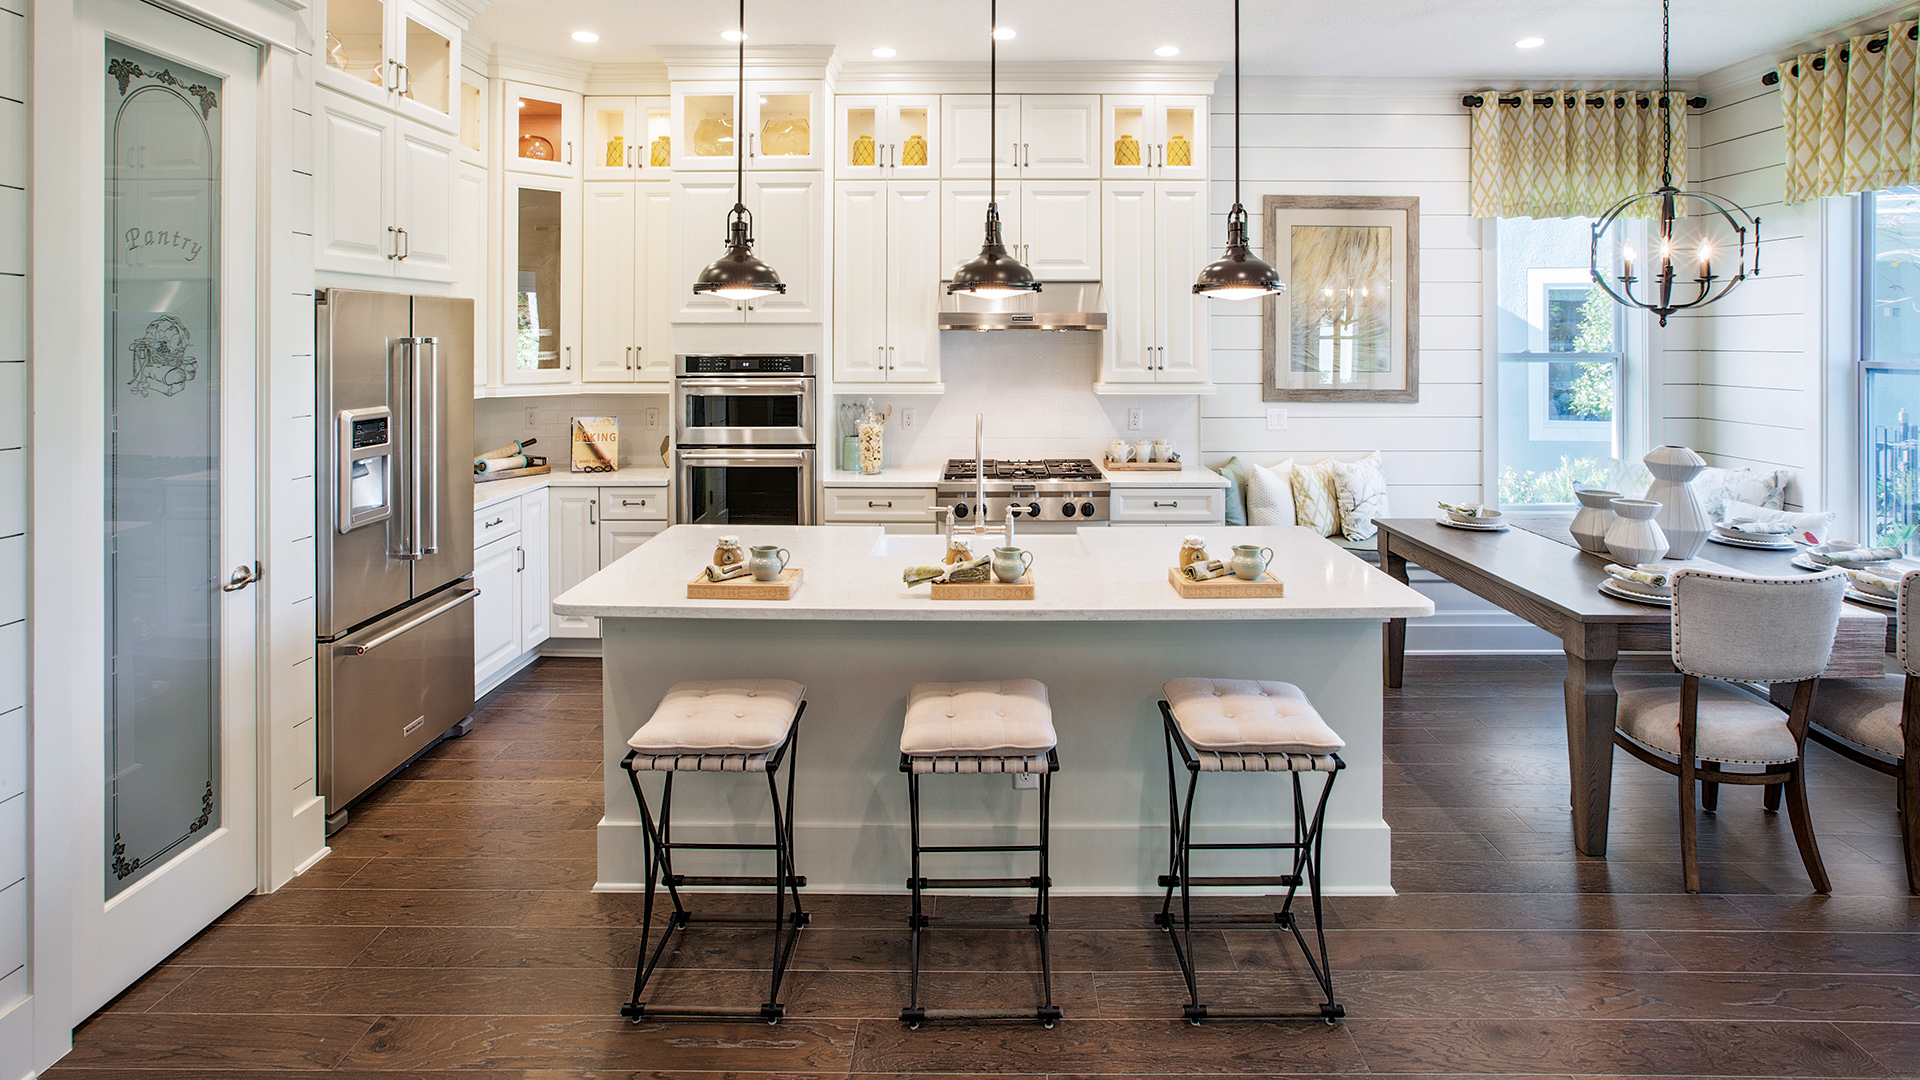 New Homes for Sale in Jacksonville, FL | Edison on mad men office design, palmer building, winchester house design, palmer furniture, frank lloyd wright design,